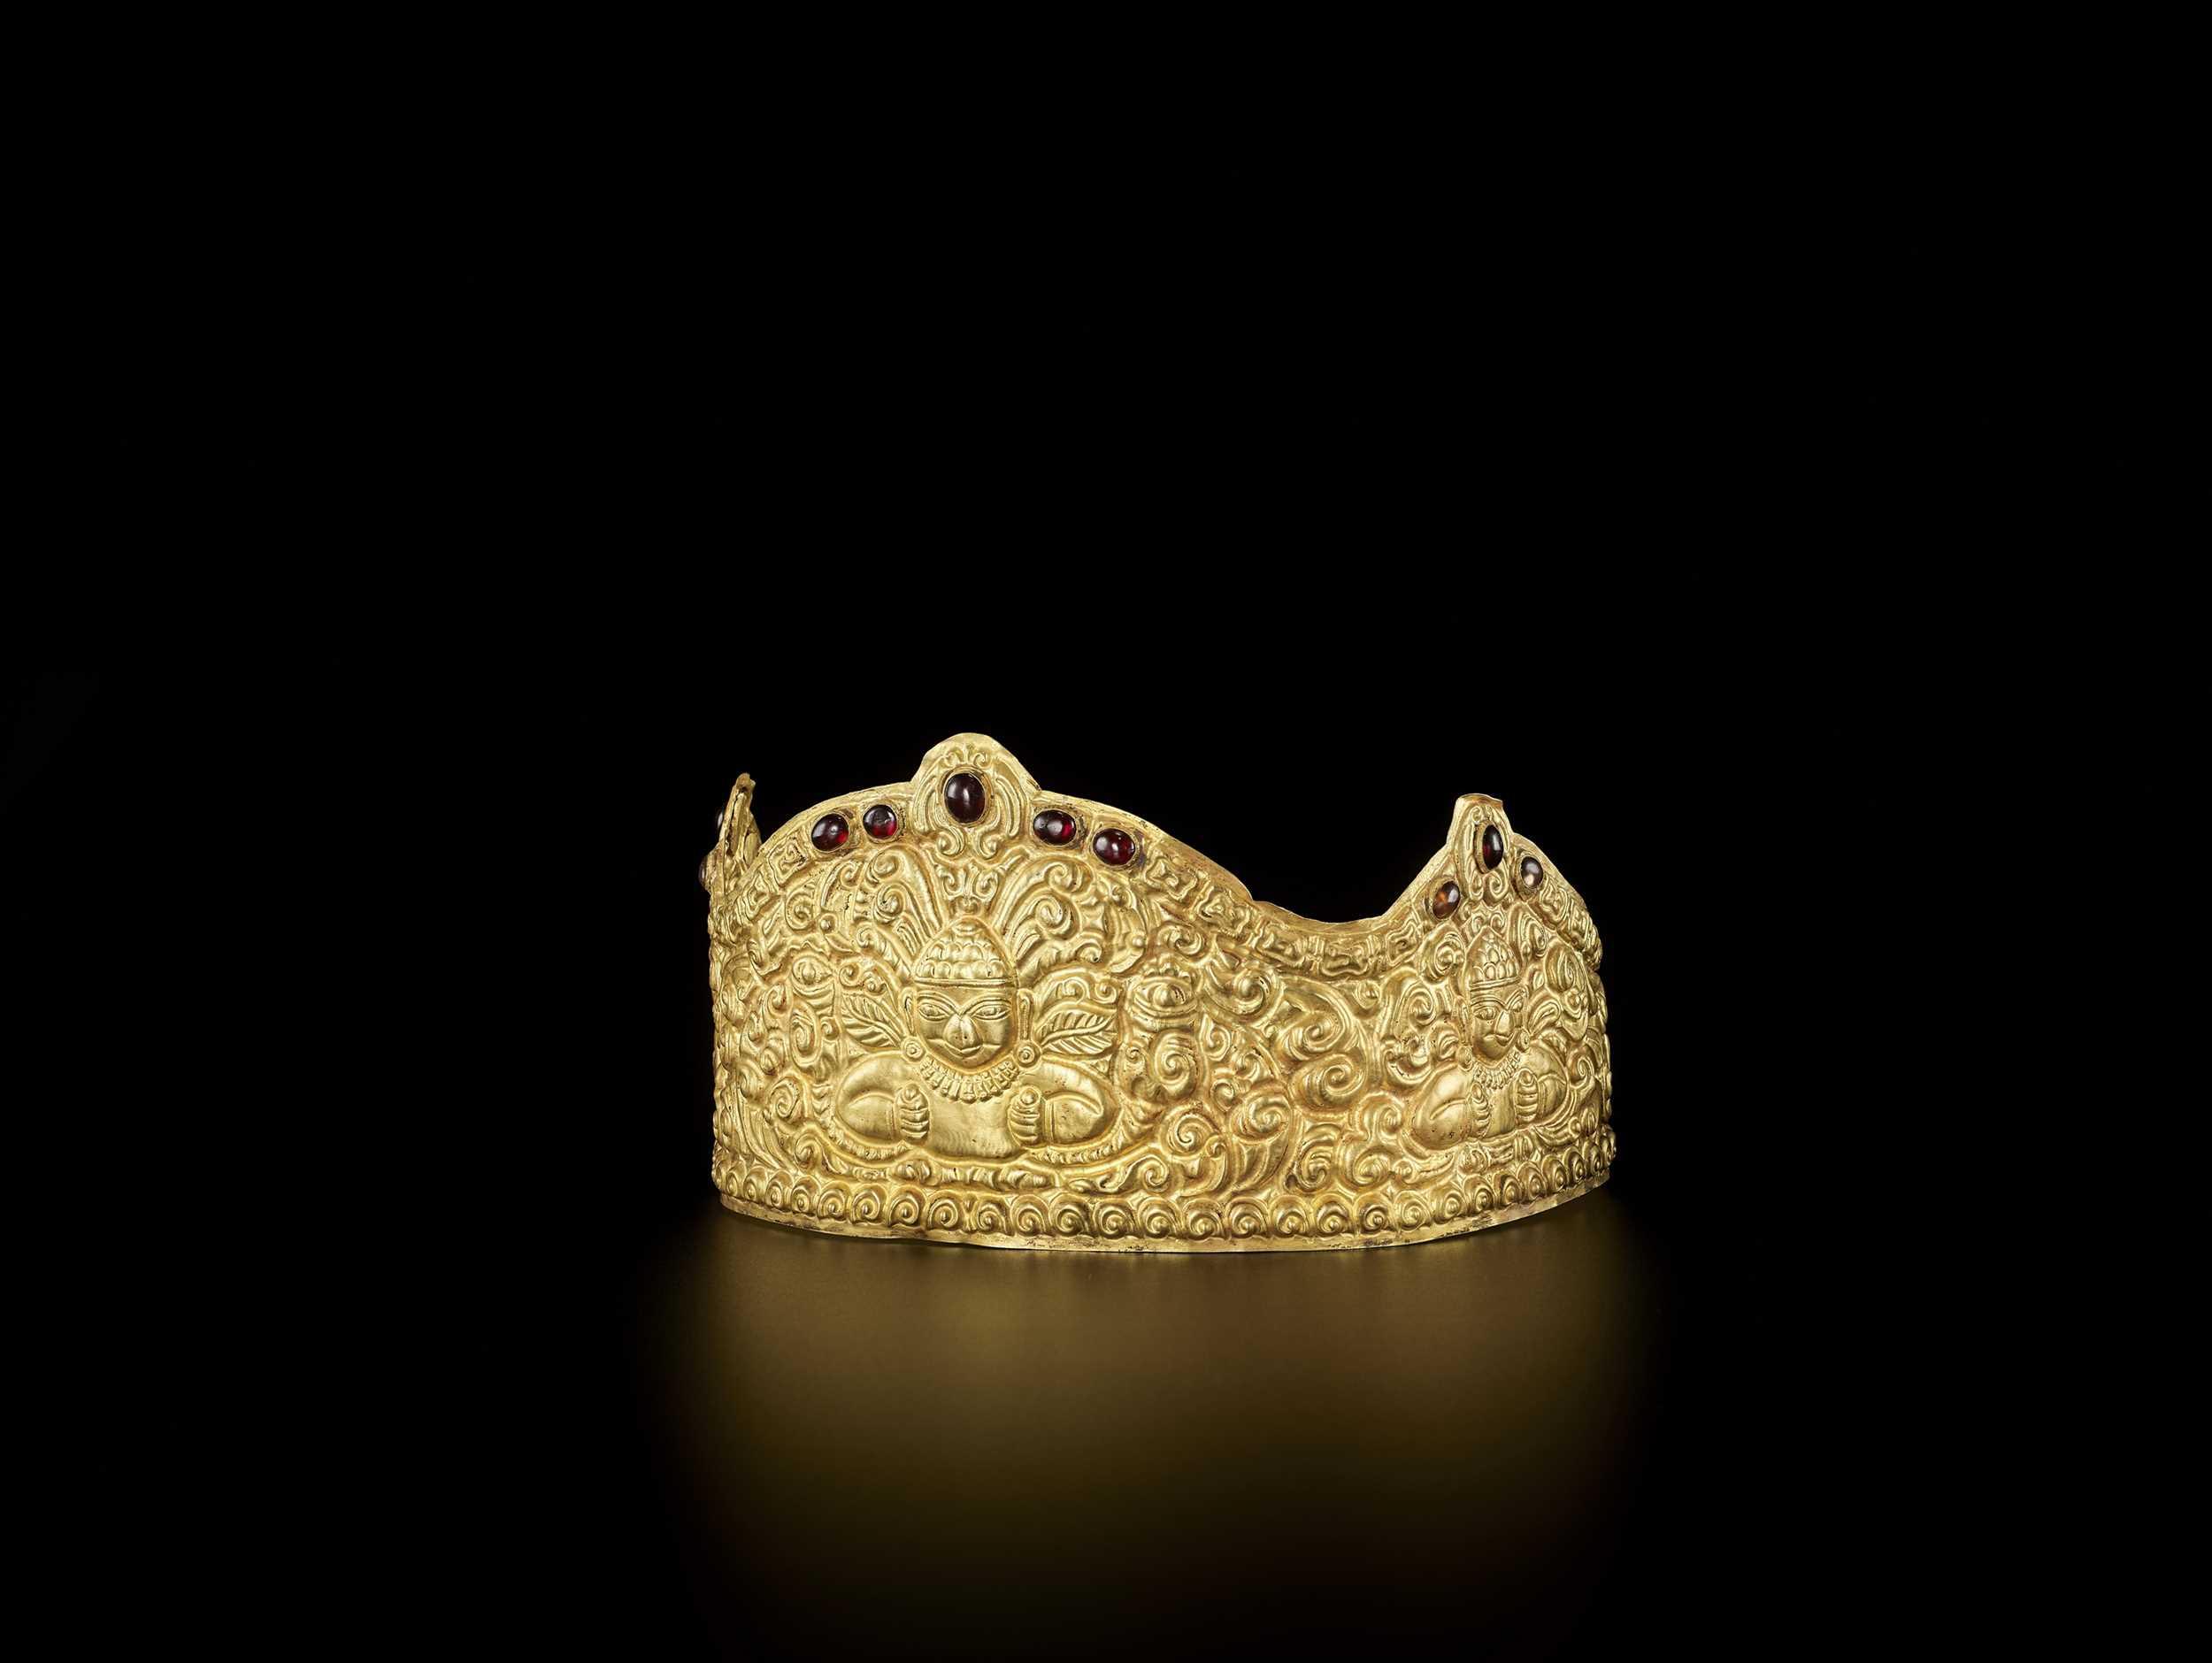 AN EXTRE MELY RARE AND FINE CHAM GEMSTONE-SET GOLD REPOUSSÉ CROWN WITH GARUDAS - Bild 9 aus 9